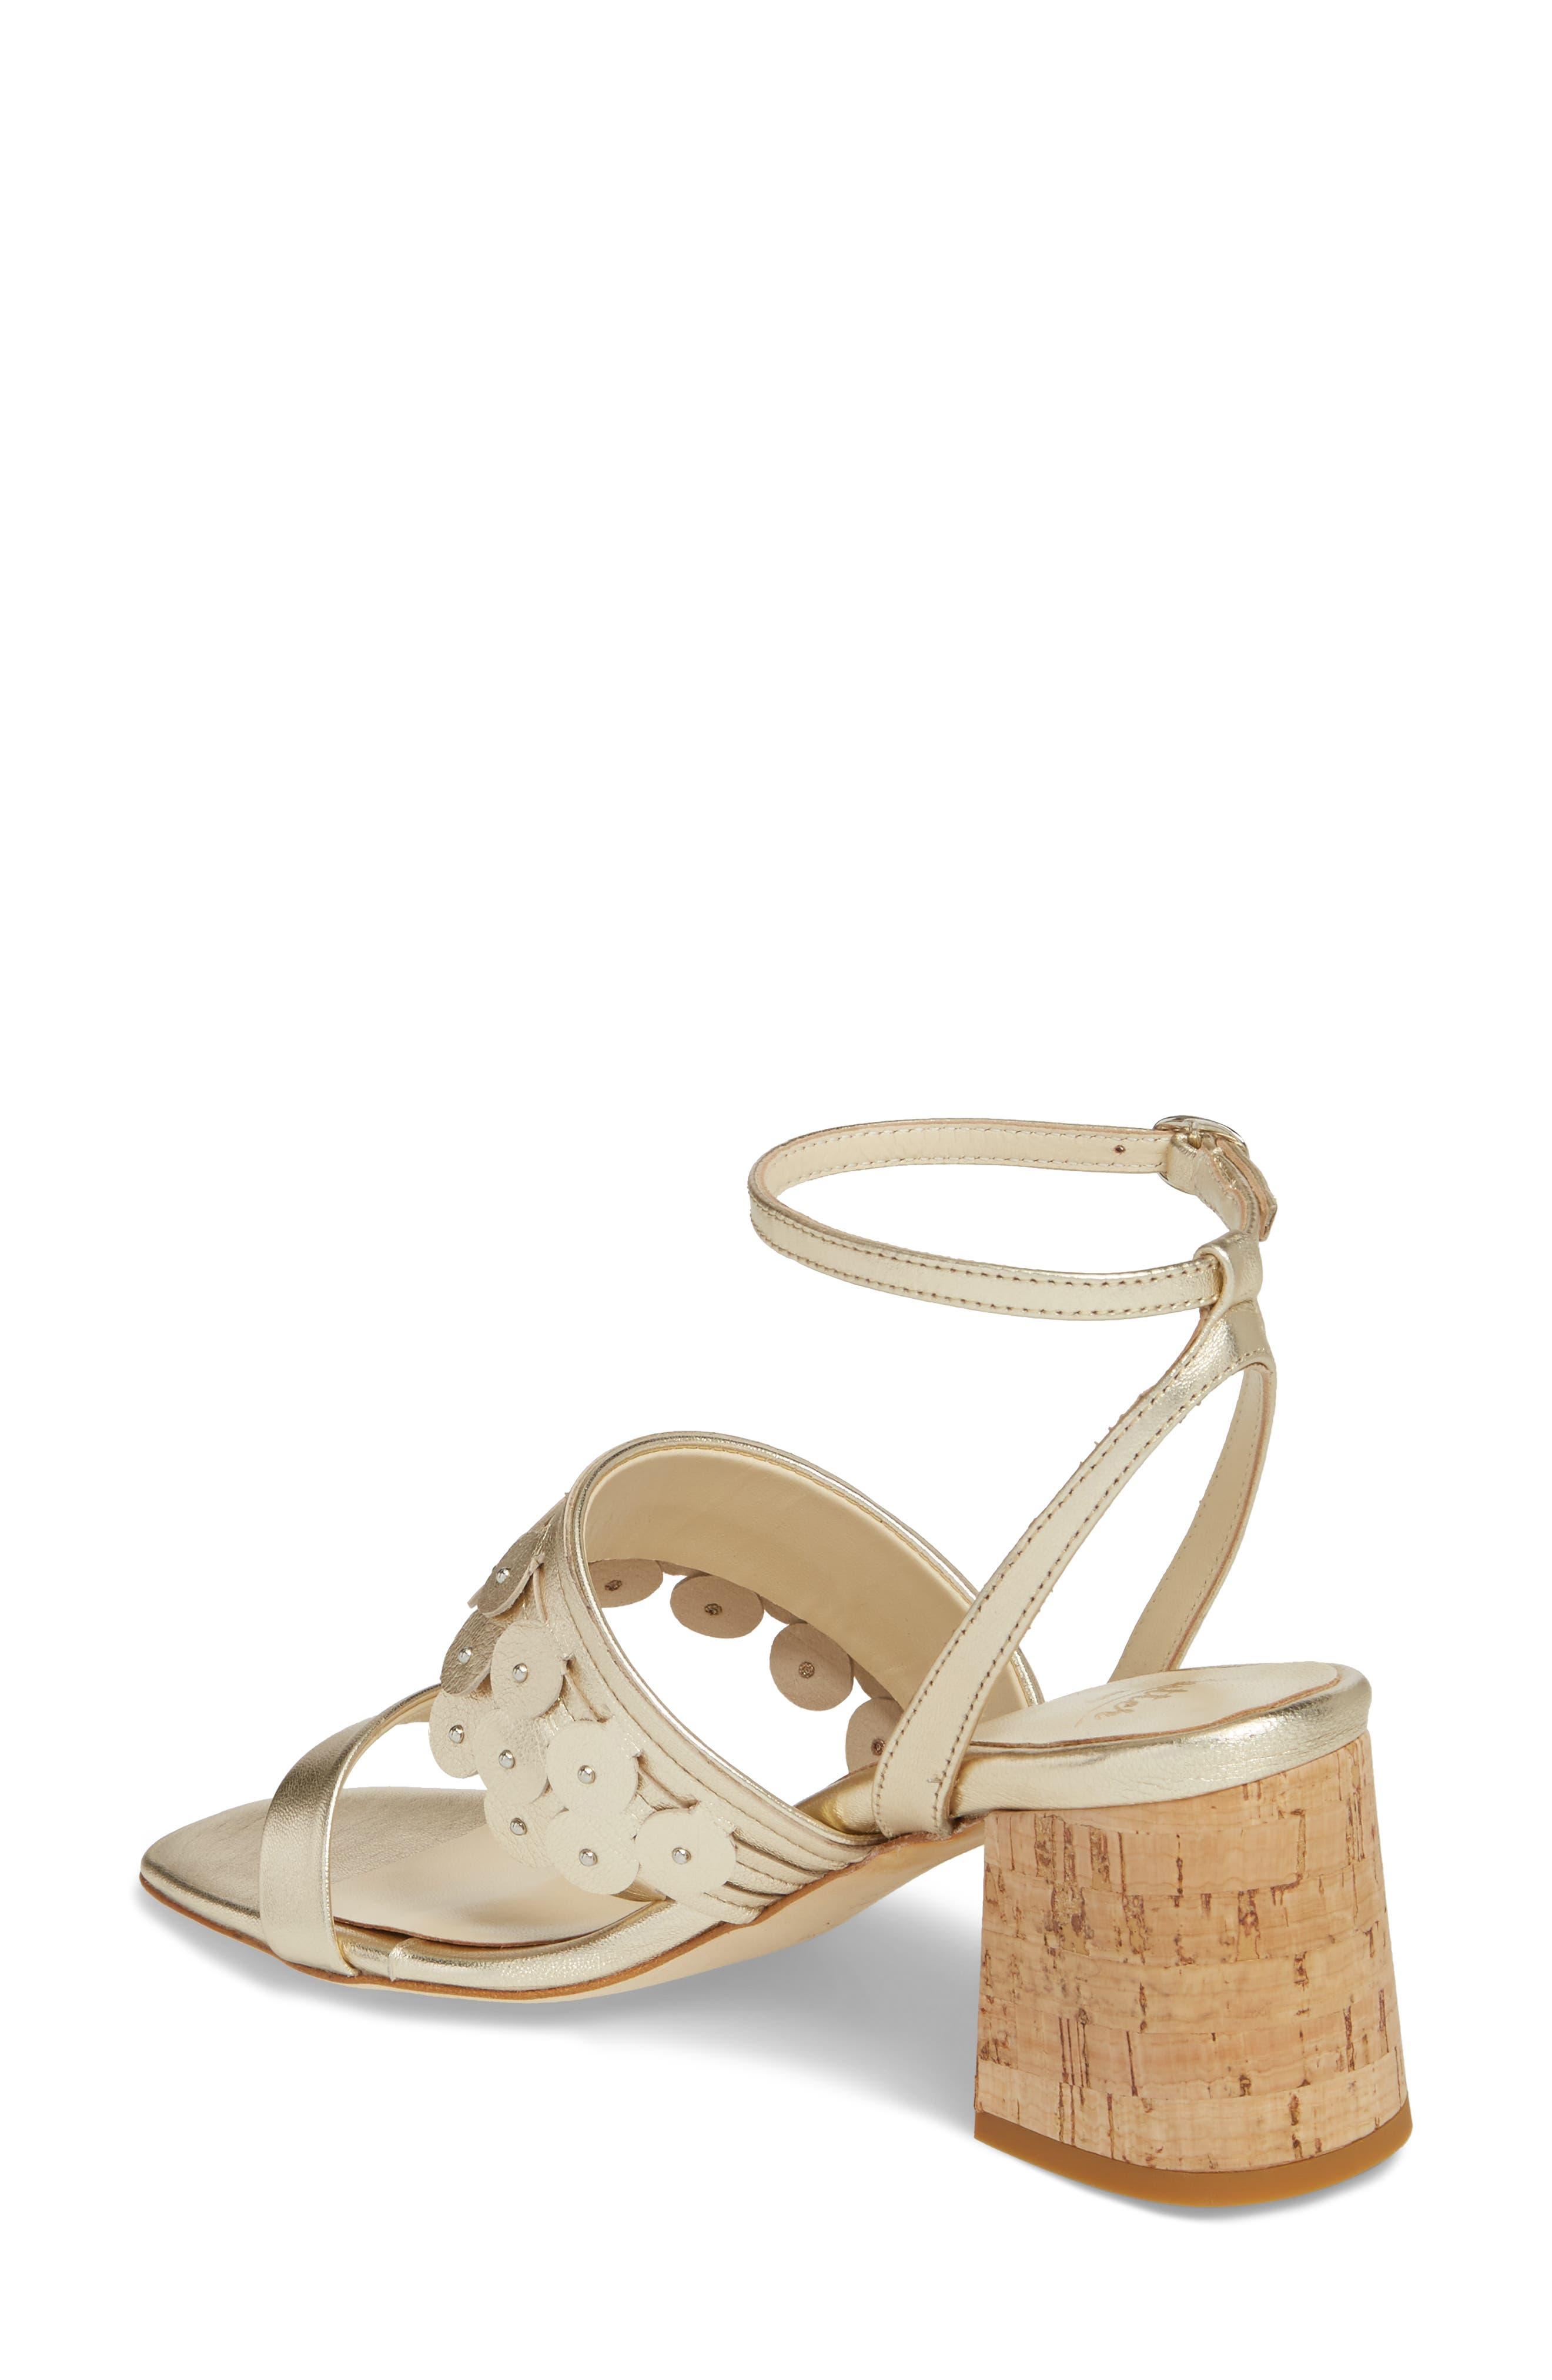 Butter Finley Studded Ankle Strap Sandal,                             Alternate thumbnail 2, color,                             Platino Napa